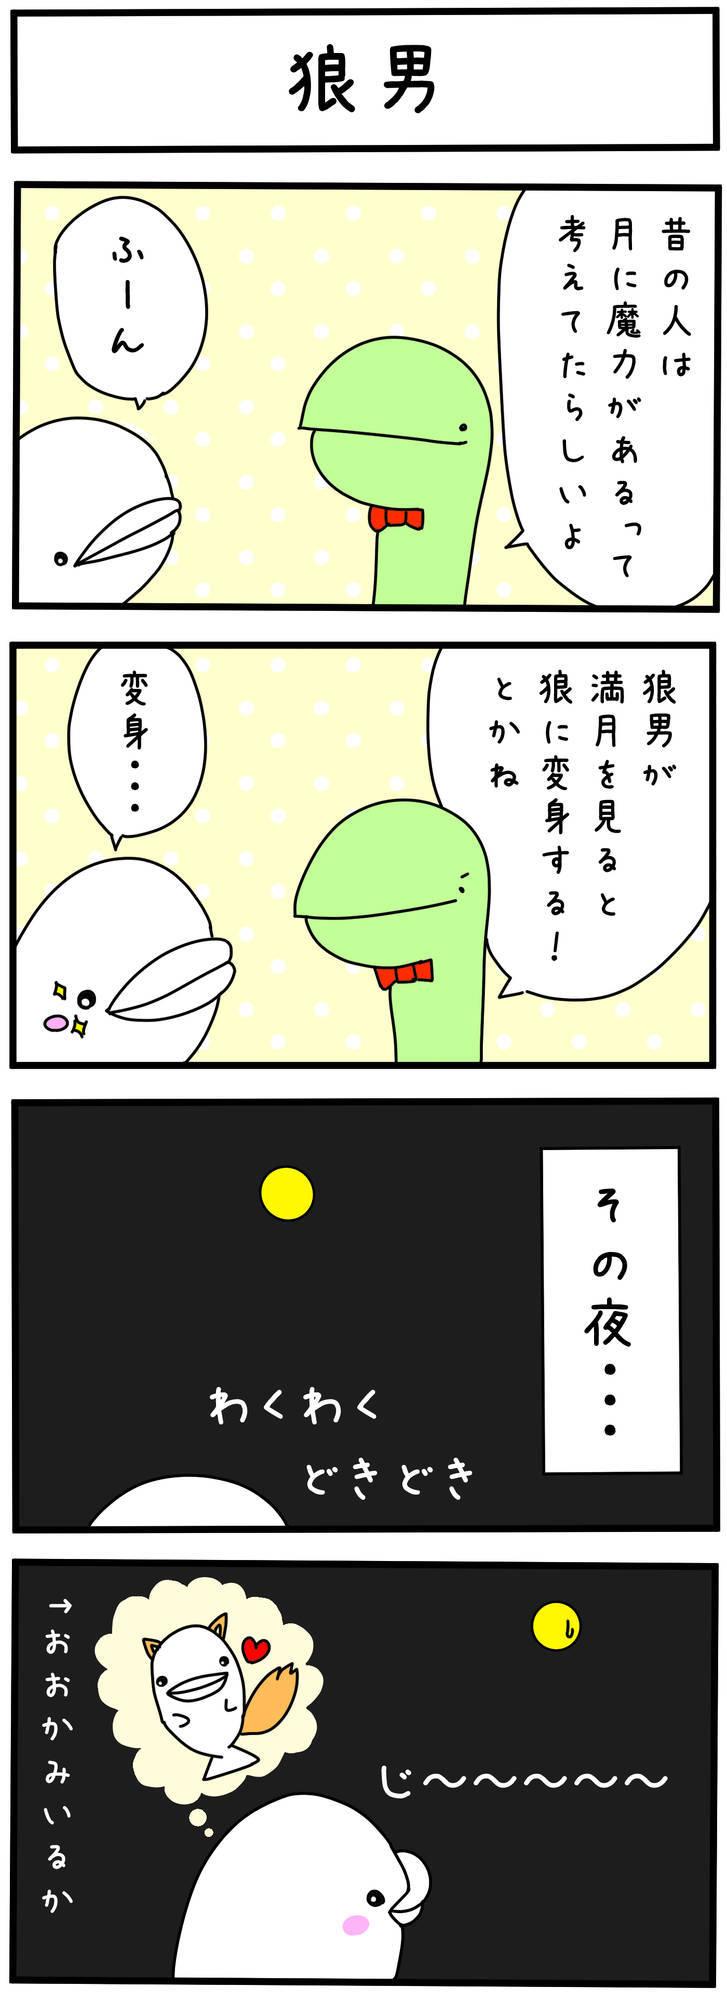 f:id:shiro_iruka:20190416195013j:plain